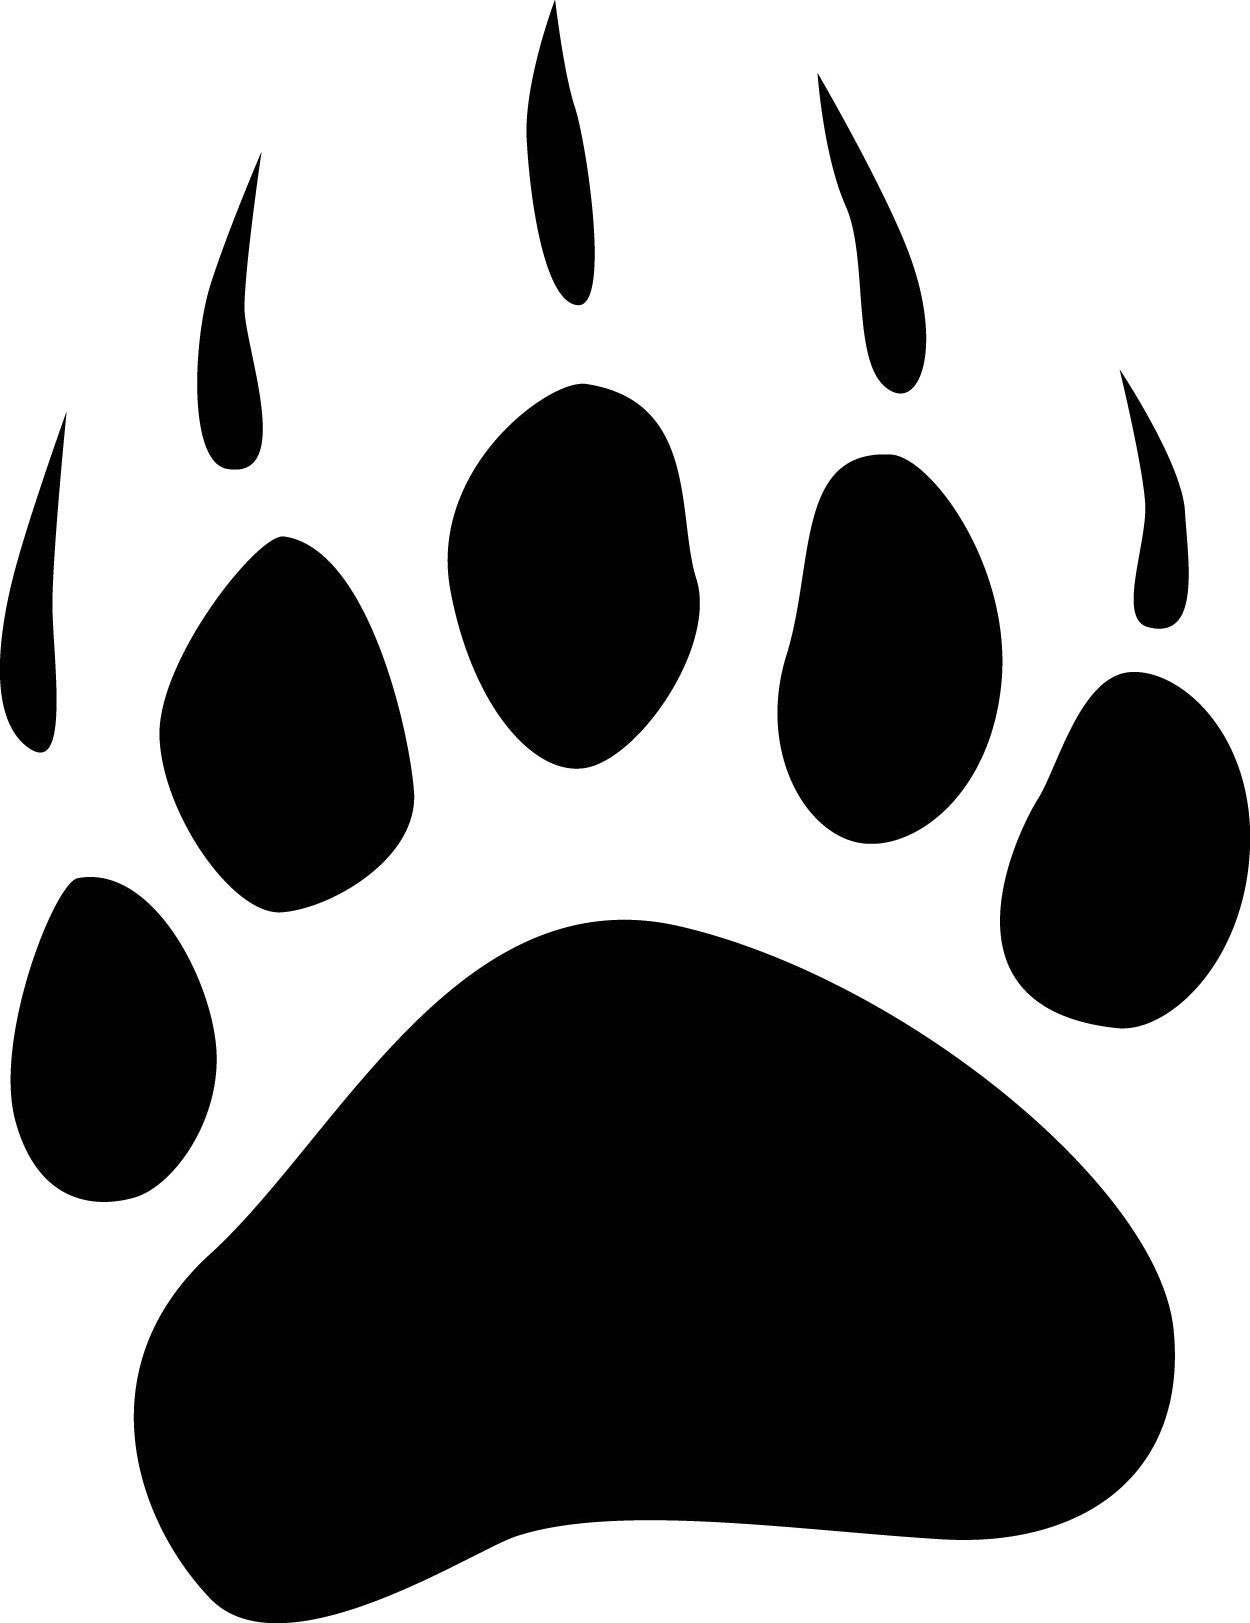 Polar bear paw print clipart best for Bear footprints template